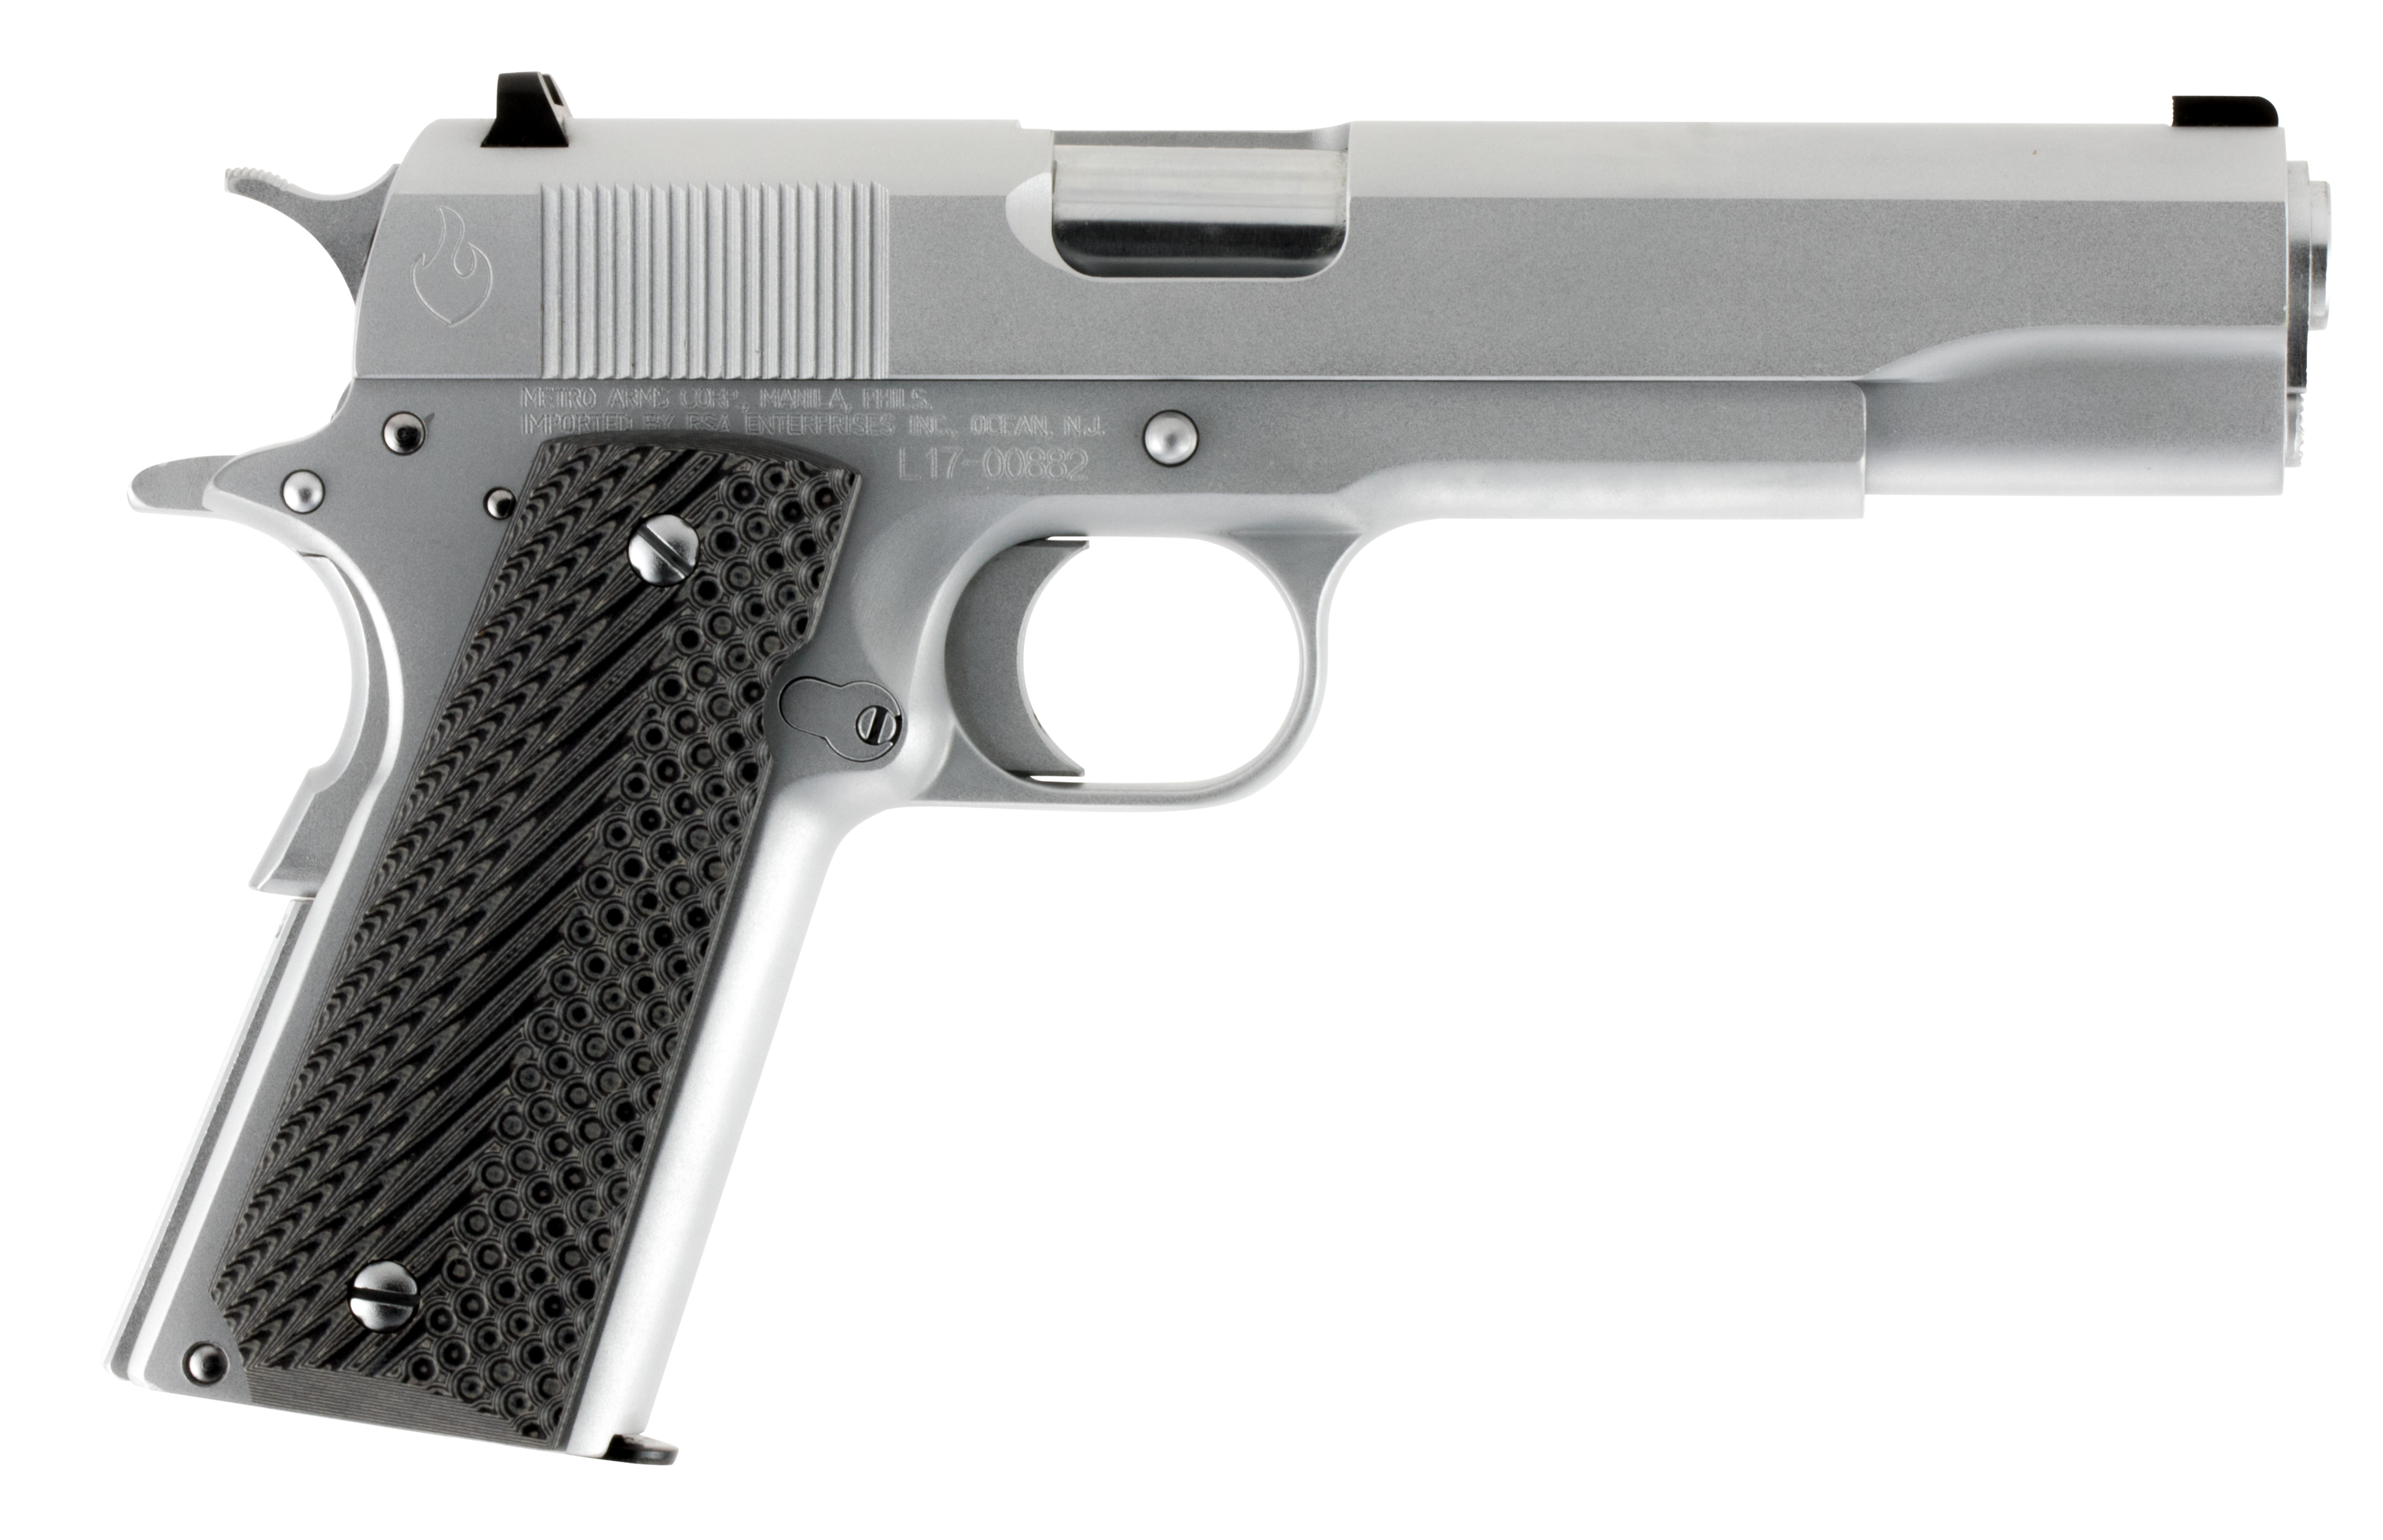 vector transparent stock 1911 clip transparent. Taurus pt acp firearm